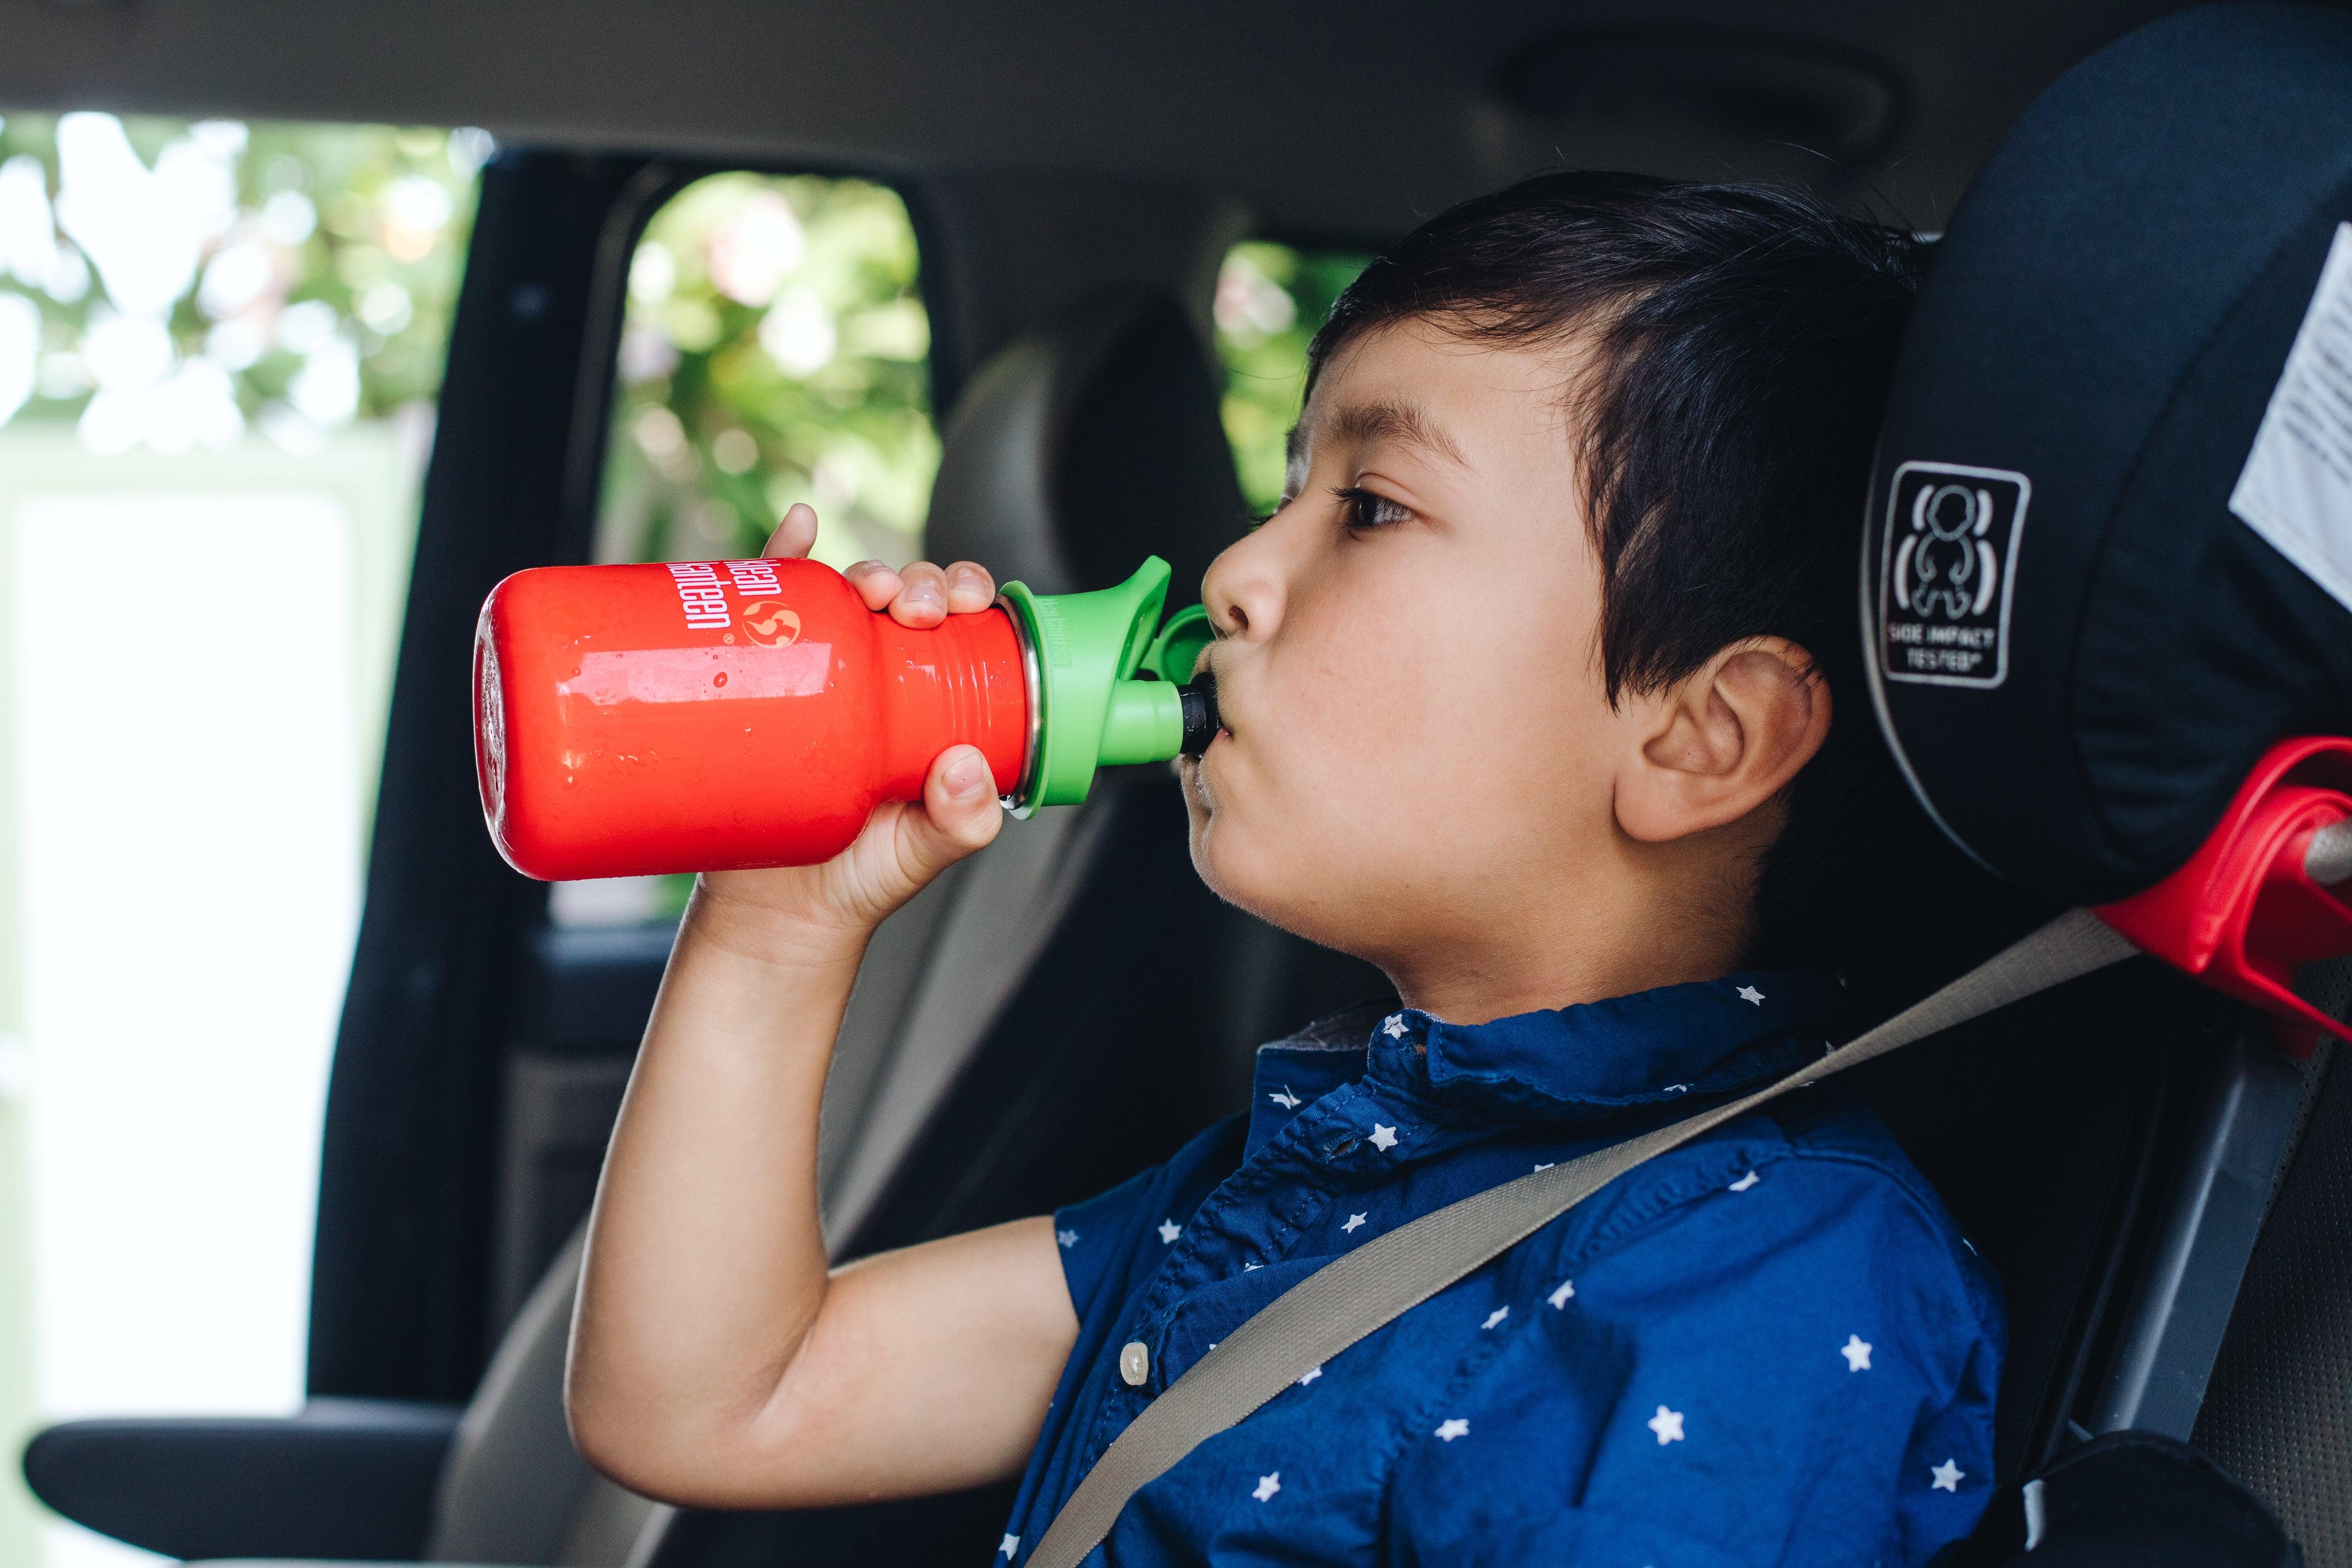 Child drinking from Kleen Kanteen